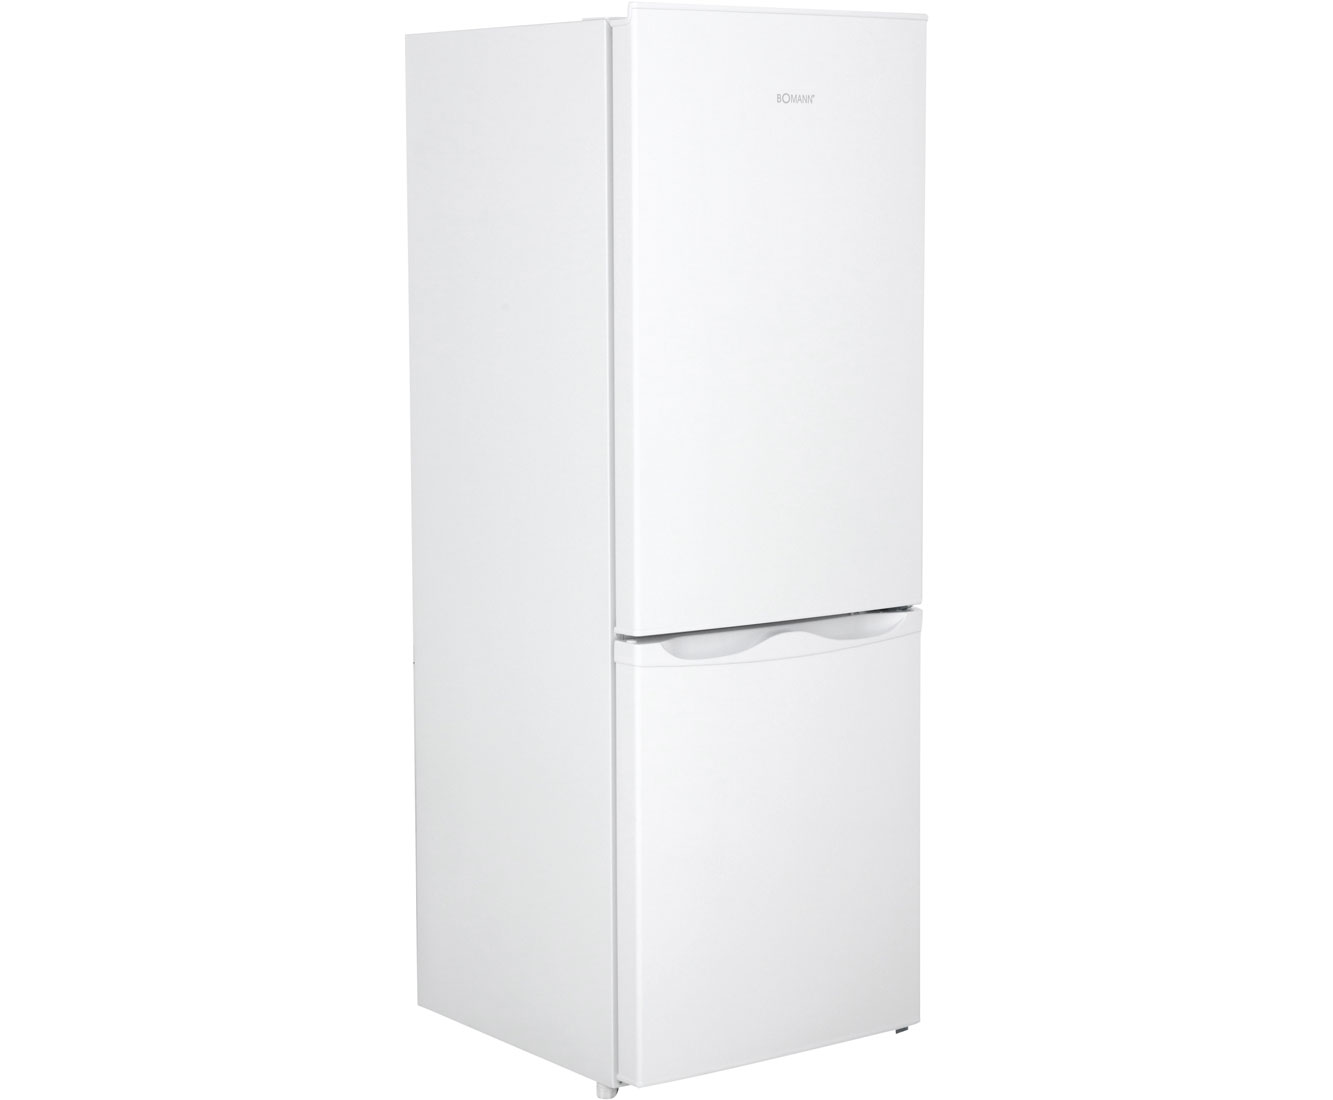 Smeg Kühlschrank Write On Me : Smeg fab ab u ac preisvergleich bei idealo at